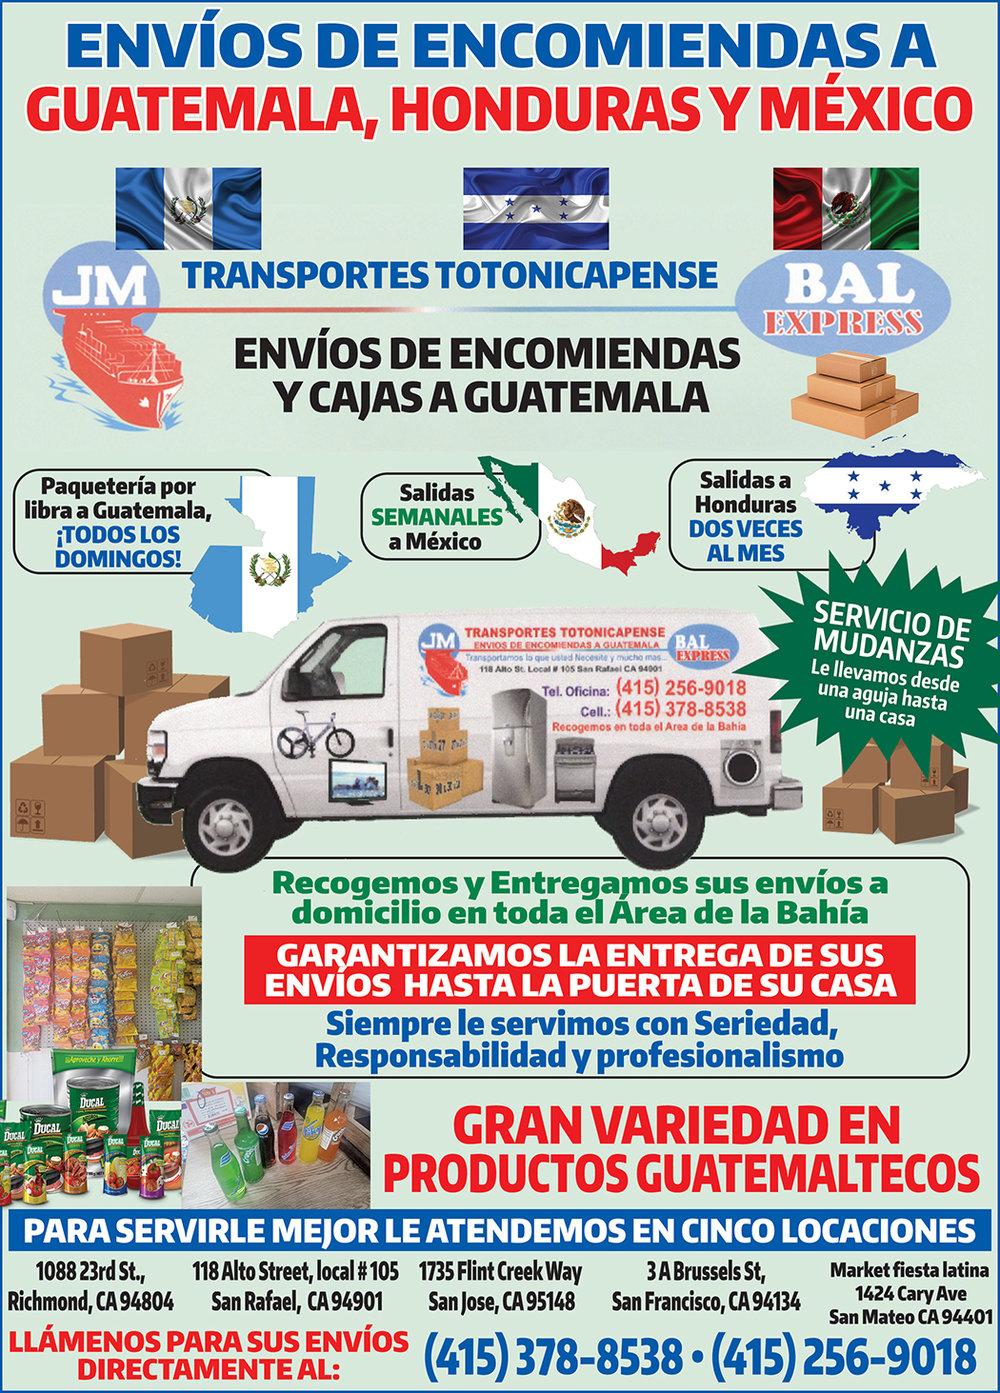 Transportes Totonicapense 1 Pag JULIO 2018 copy.jpg